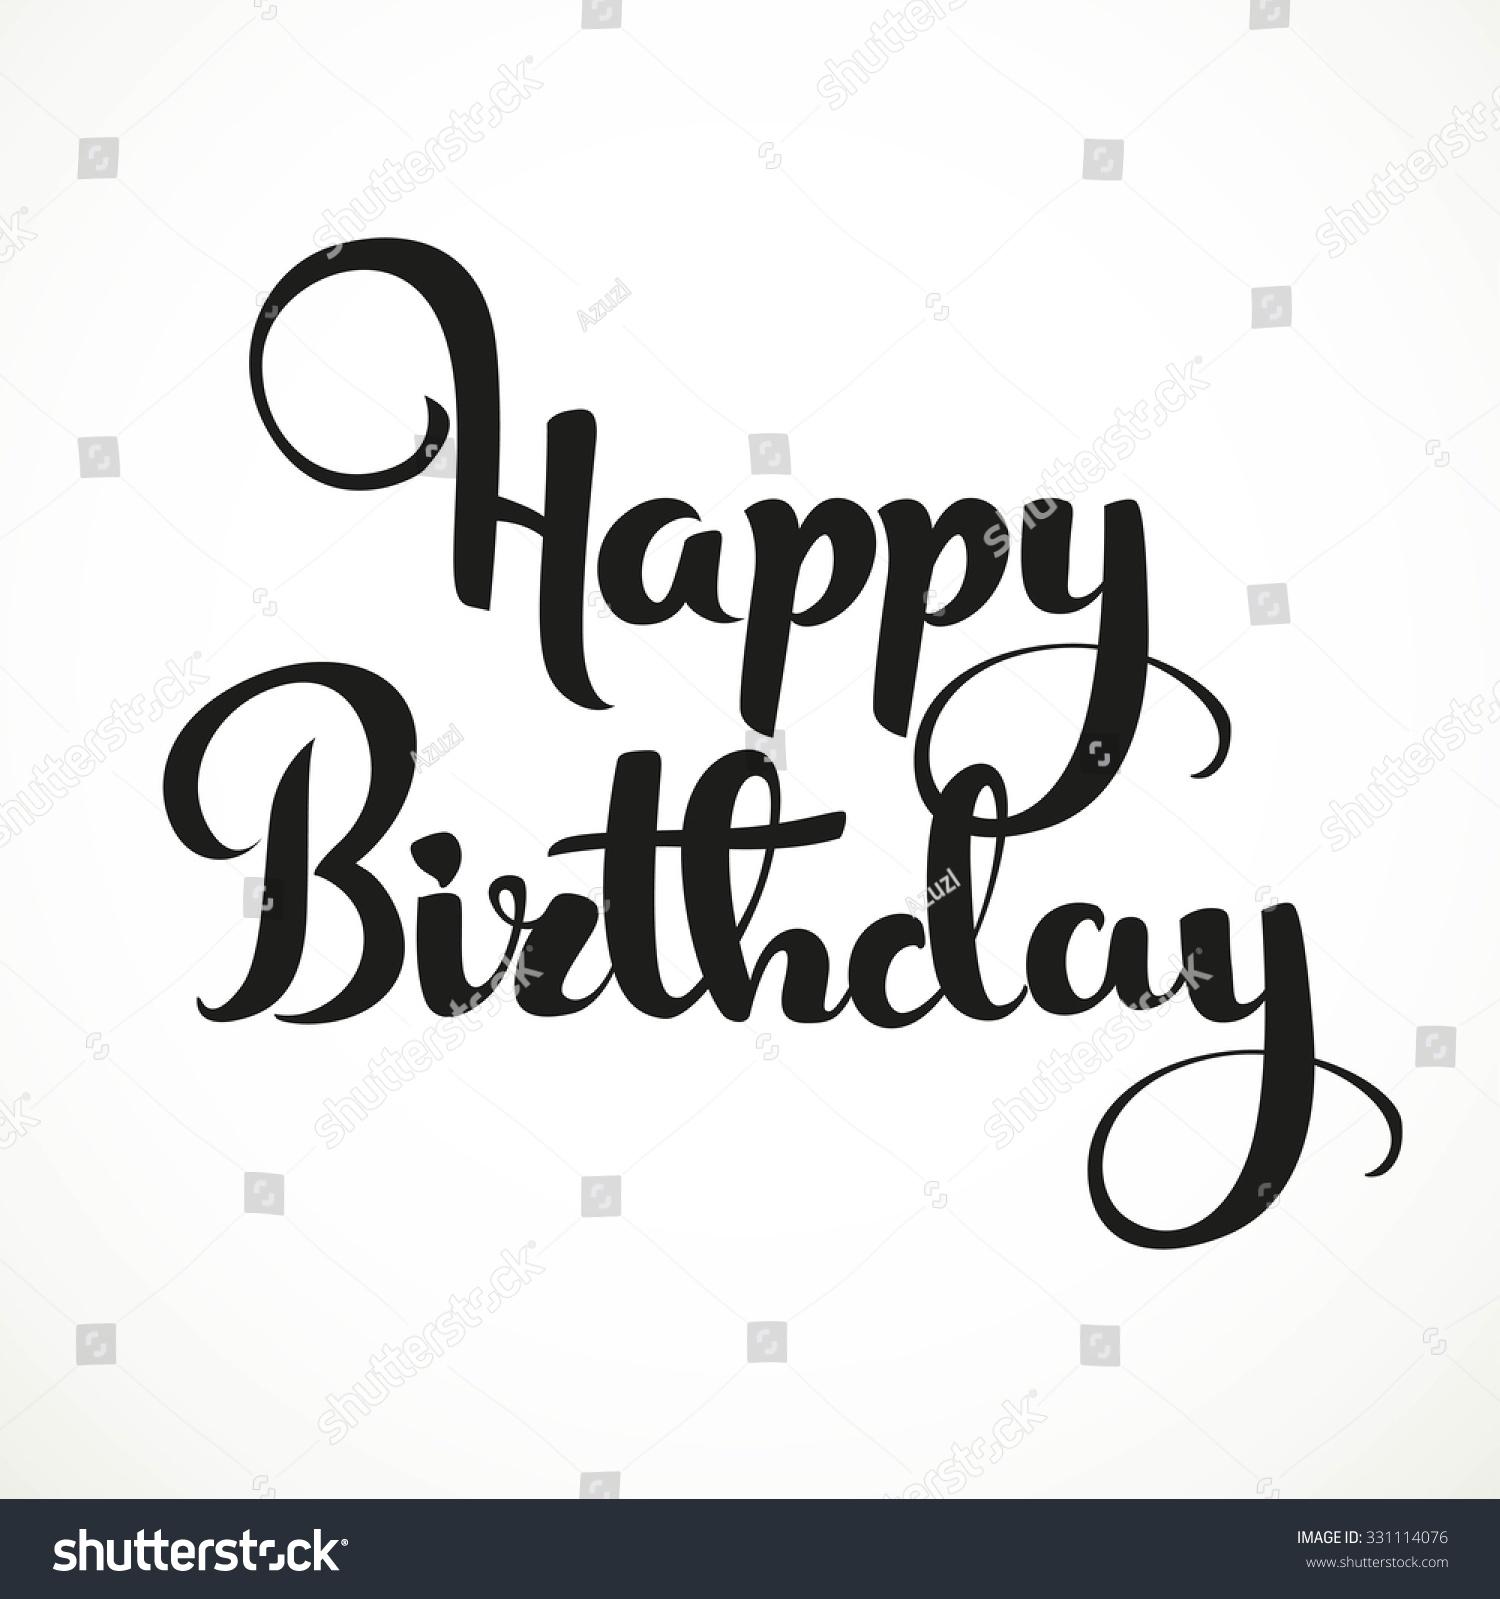 Happy birthday calligraphic inscription isolated on stock